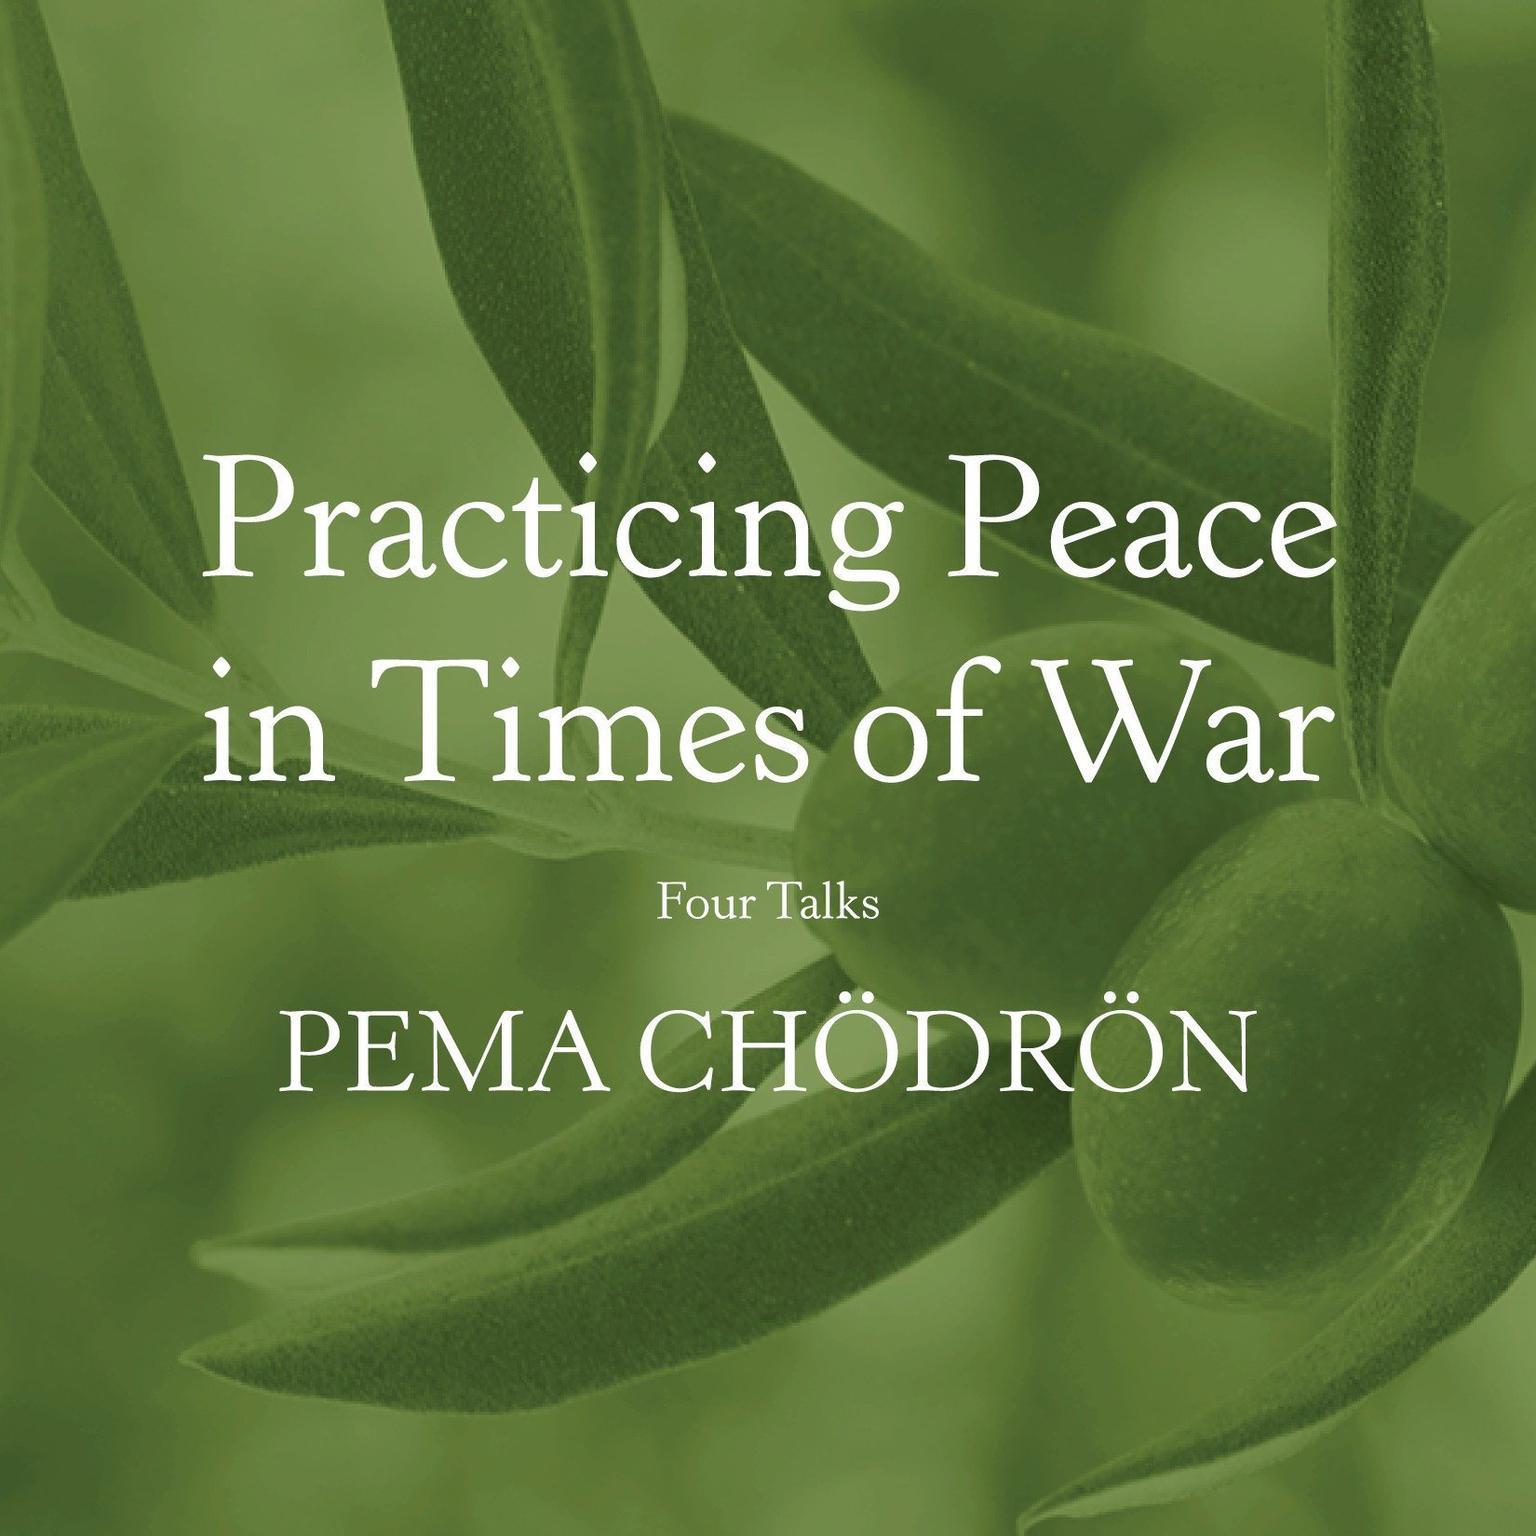 Practicing Peace in Times of War: Four Talks Audiobook, by Pema Chödrön